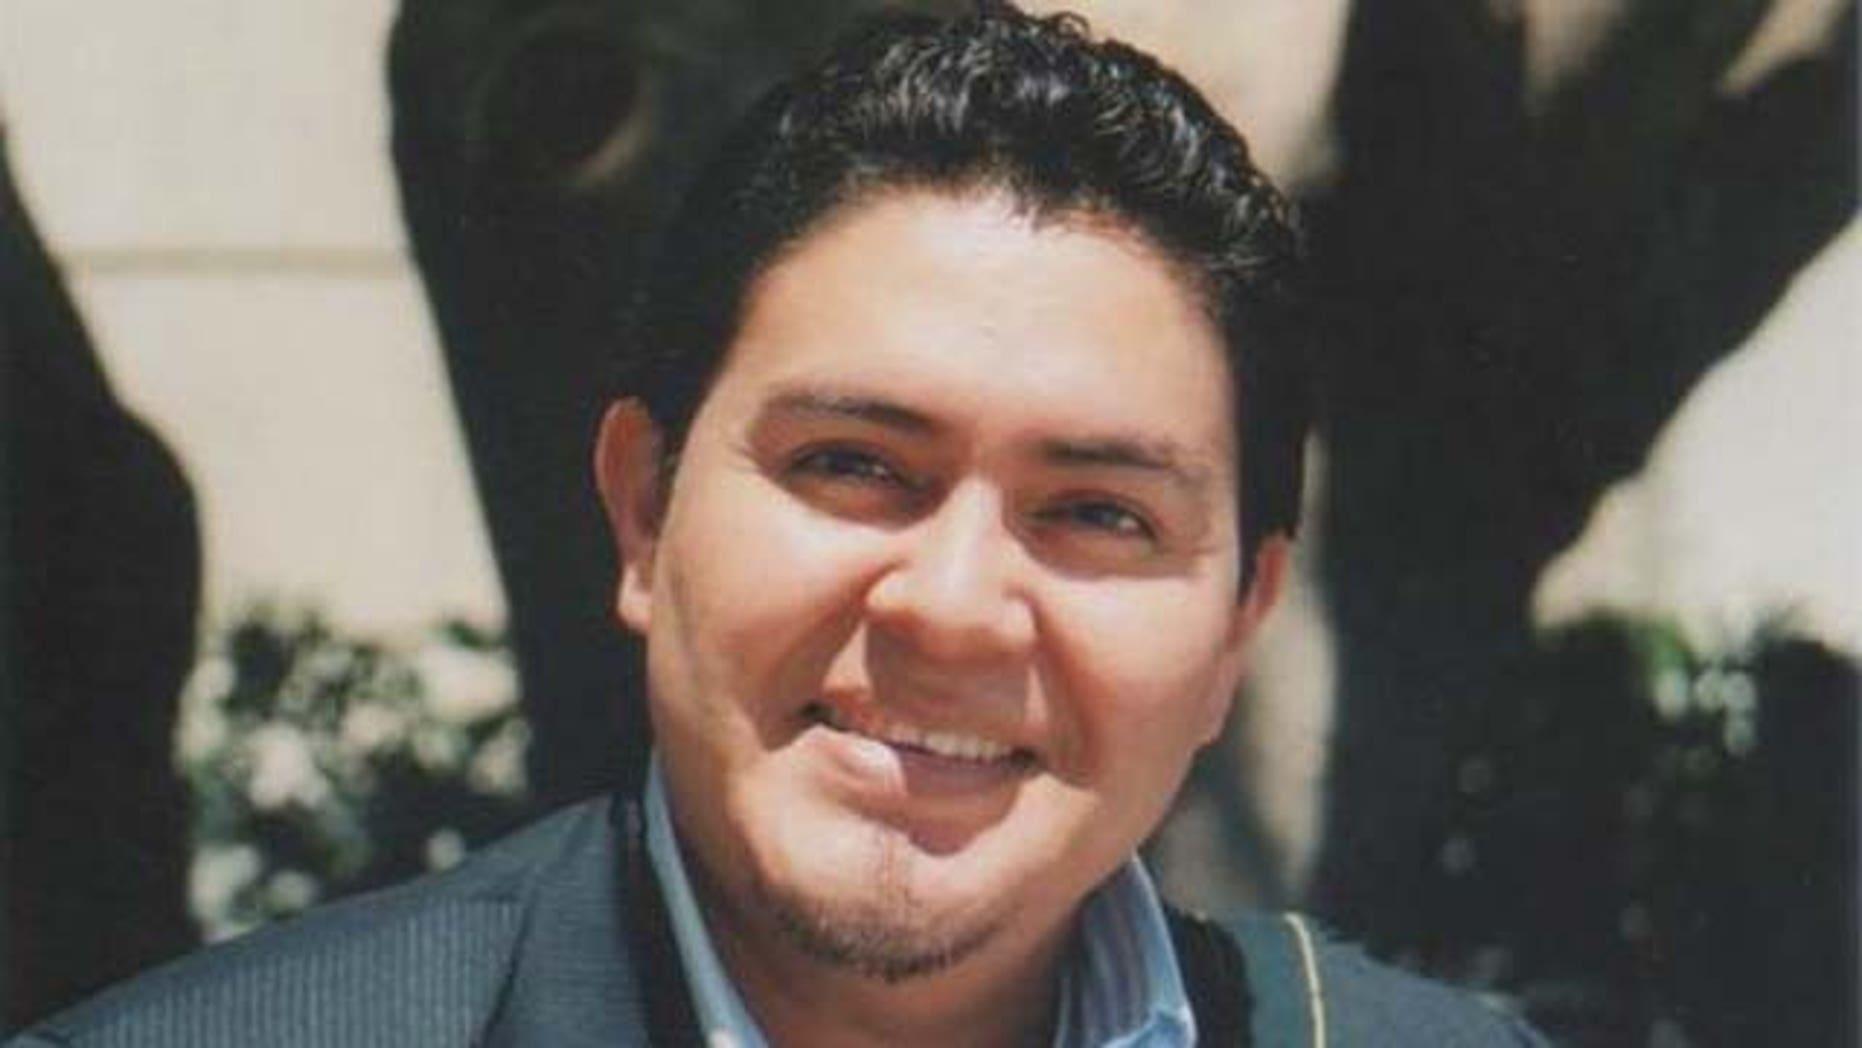 Jorge-Mario Cabrera of CHIRLA